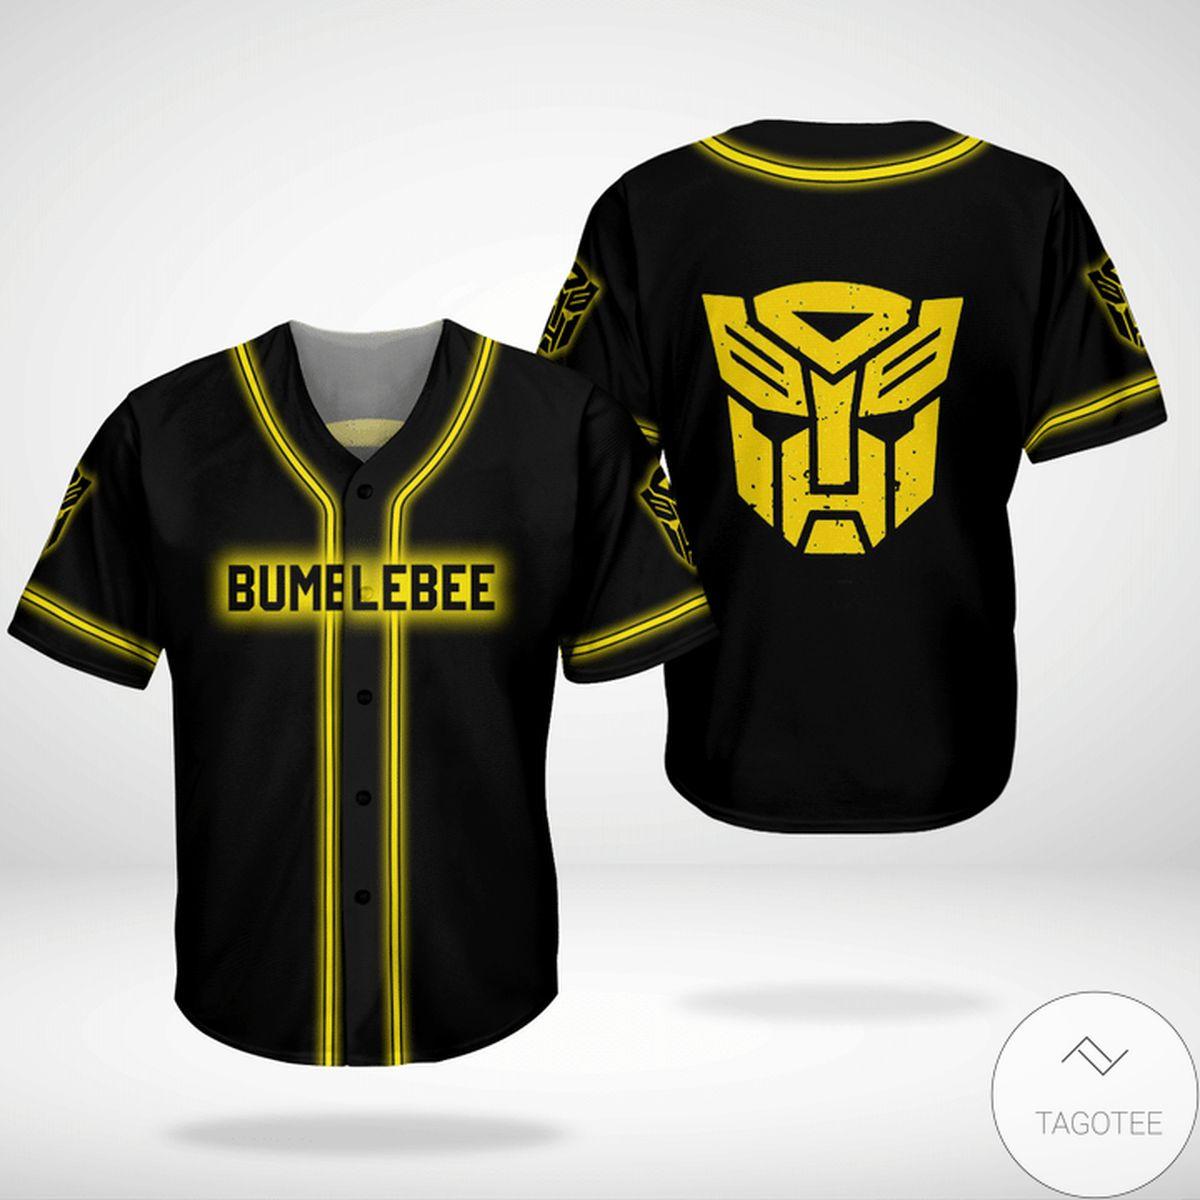 Bumblebee Transformer Jersey Baseball Shirt